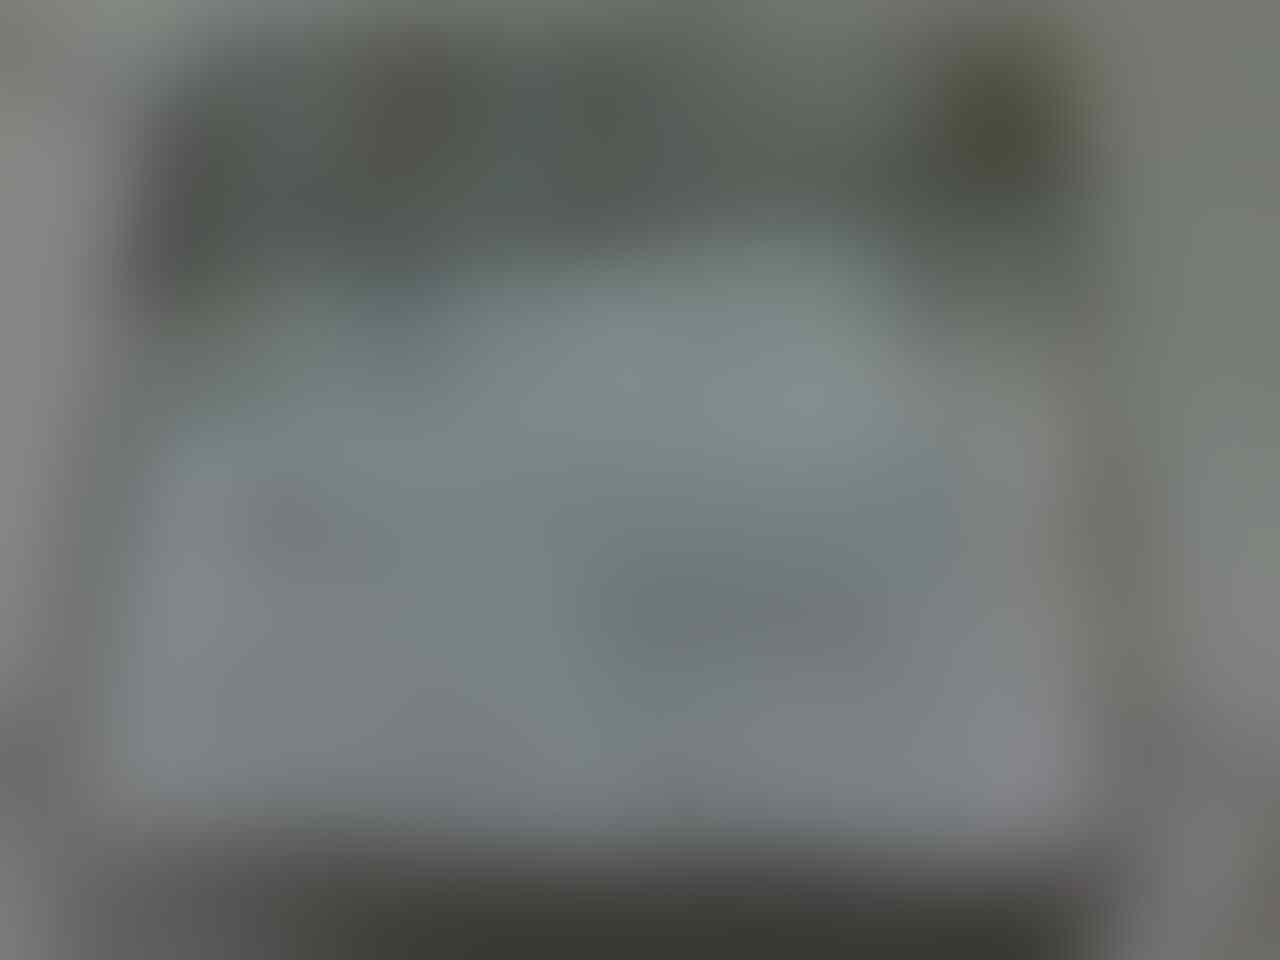 ▓█ NEW COOLERMASTER PSU POWER SUPPLY Elite Power 350W GX II 550W 80 Plus Bronze ▓█